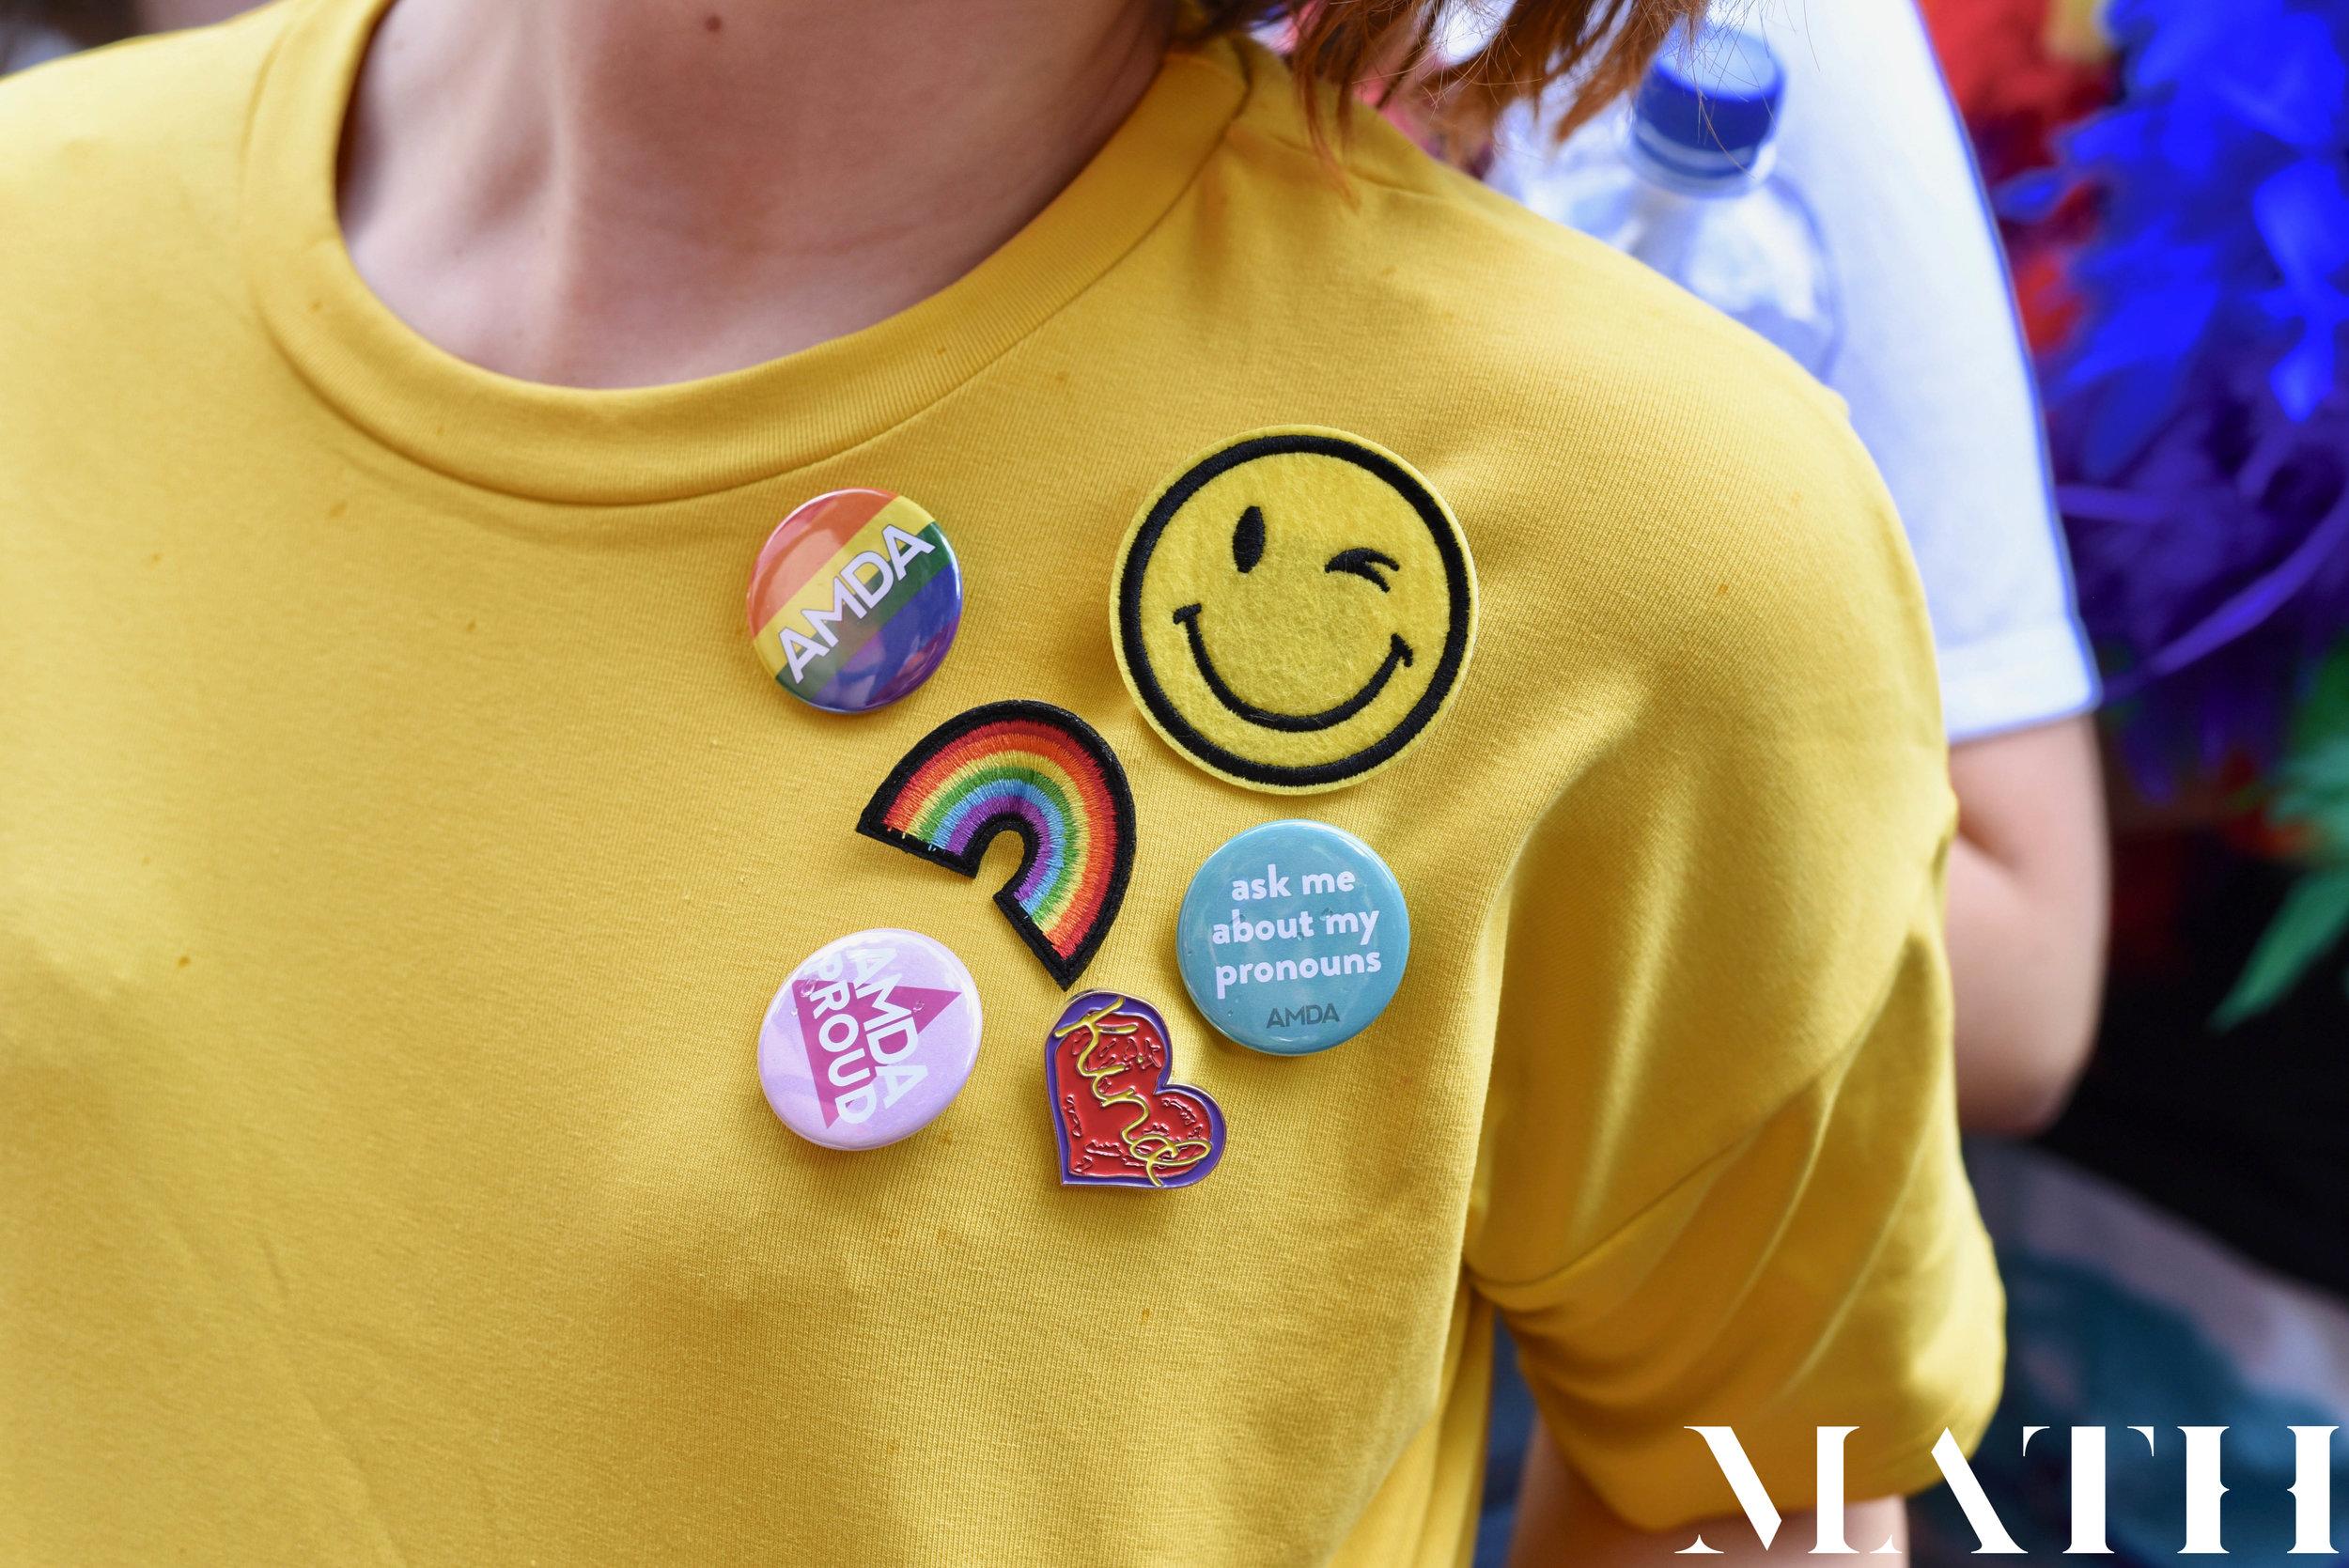 NYC Pride_Ginger Hollander 24.jpg